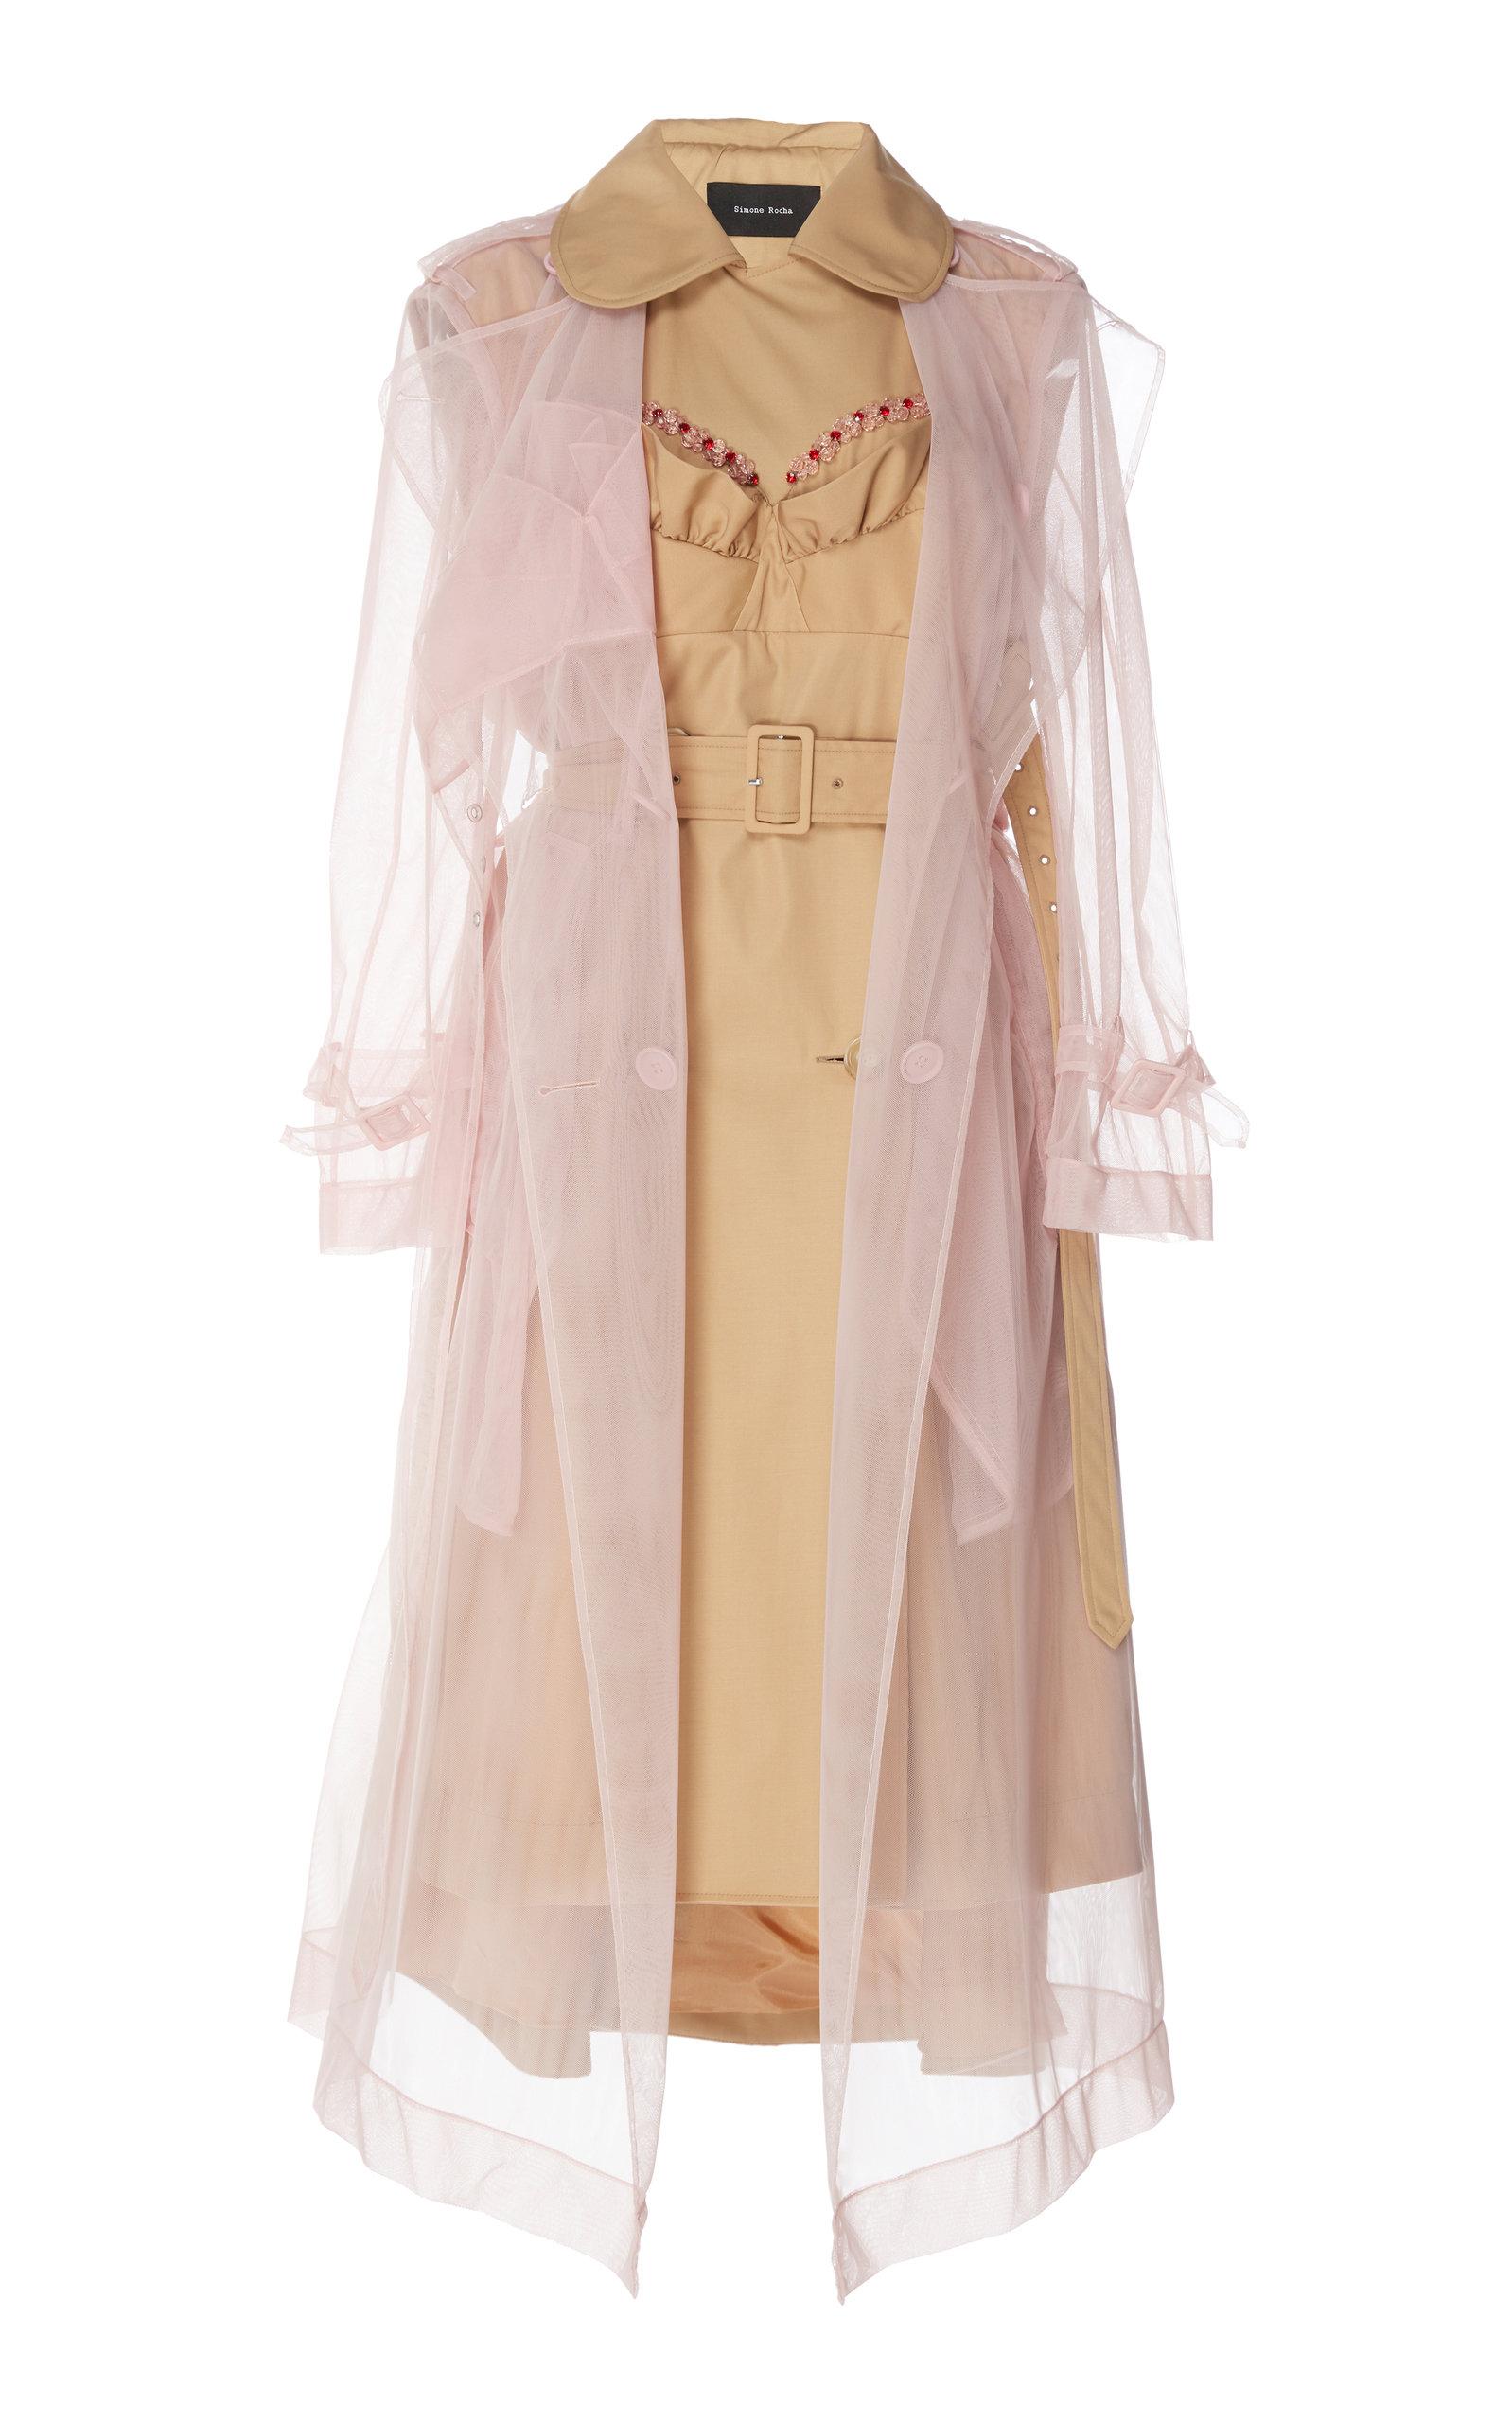 Moda Simone Operandi Tulle Rocha By Belted Coat Trench wS0nIHq0fY